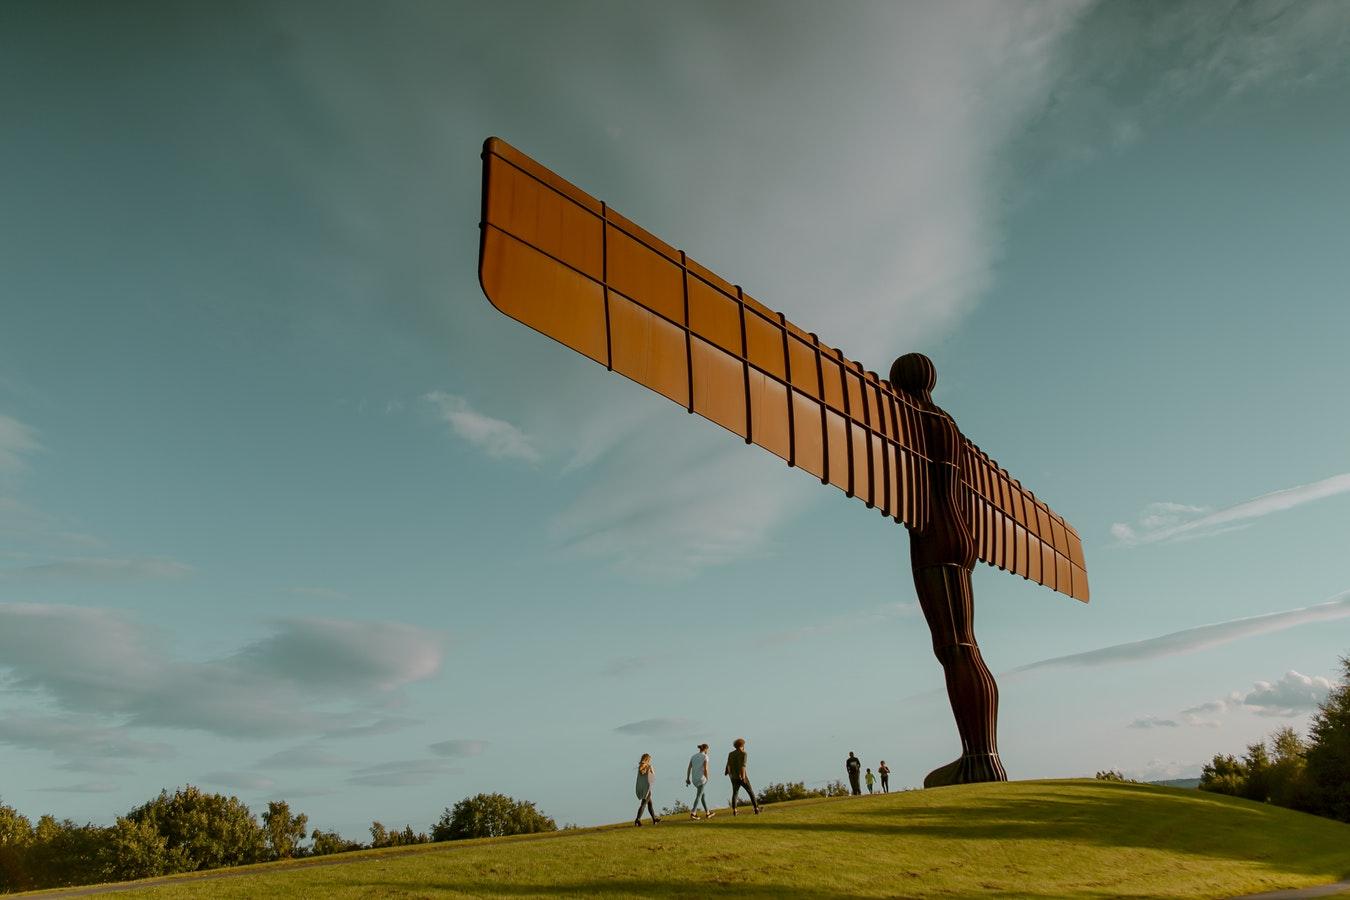 Sunderland & Newcastle - a property market update